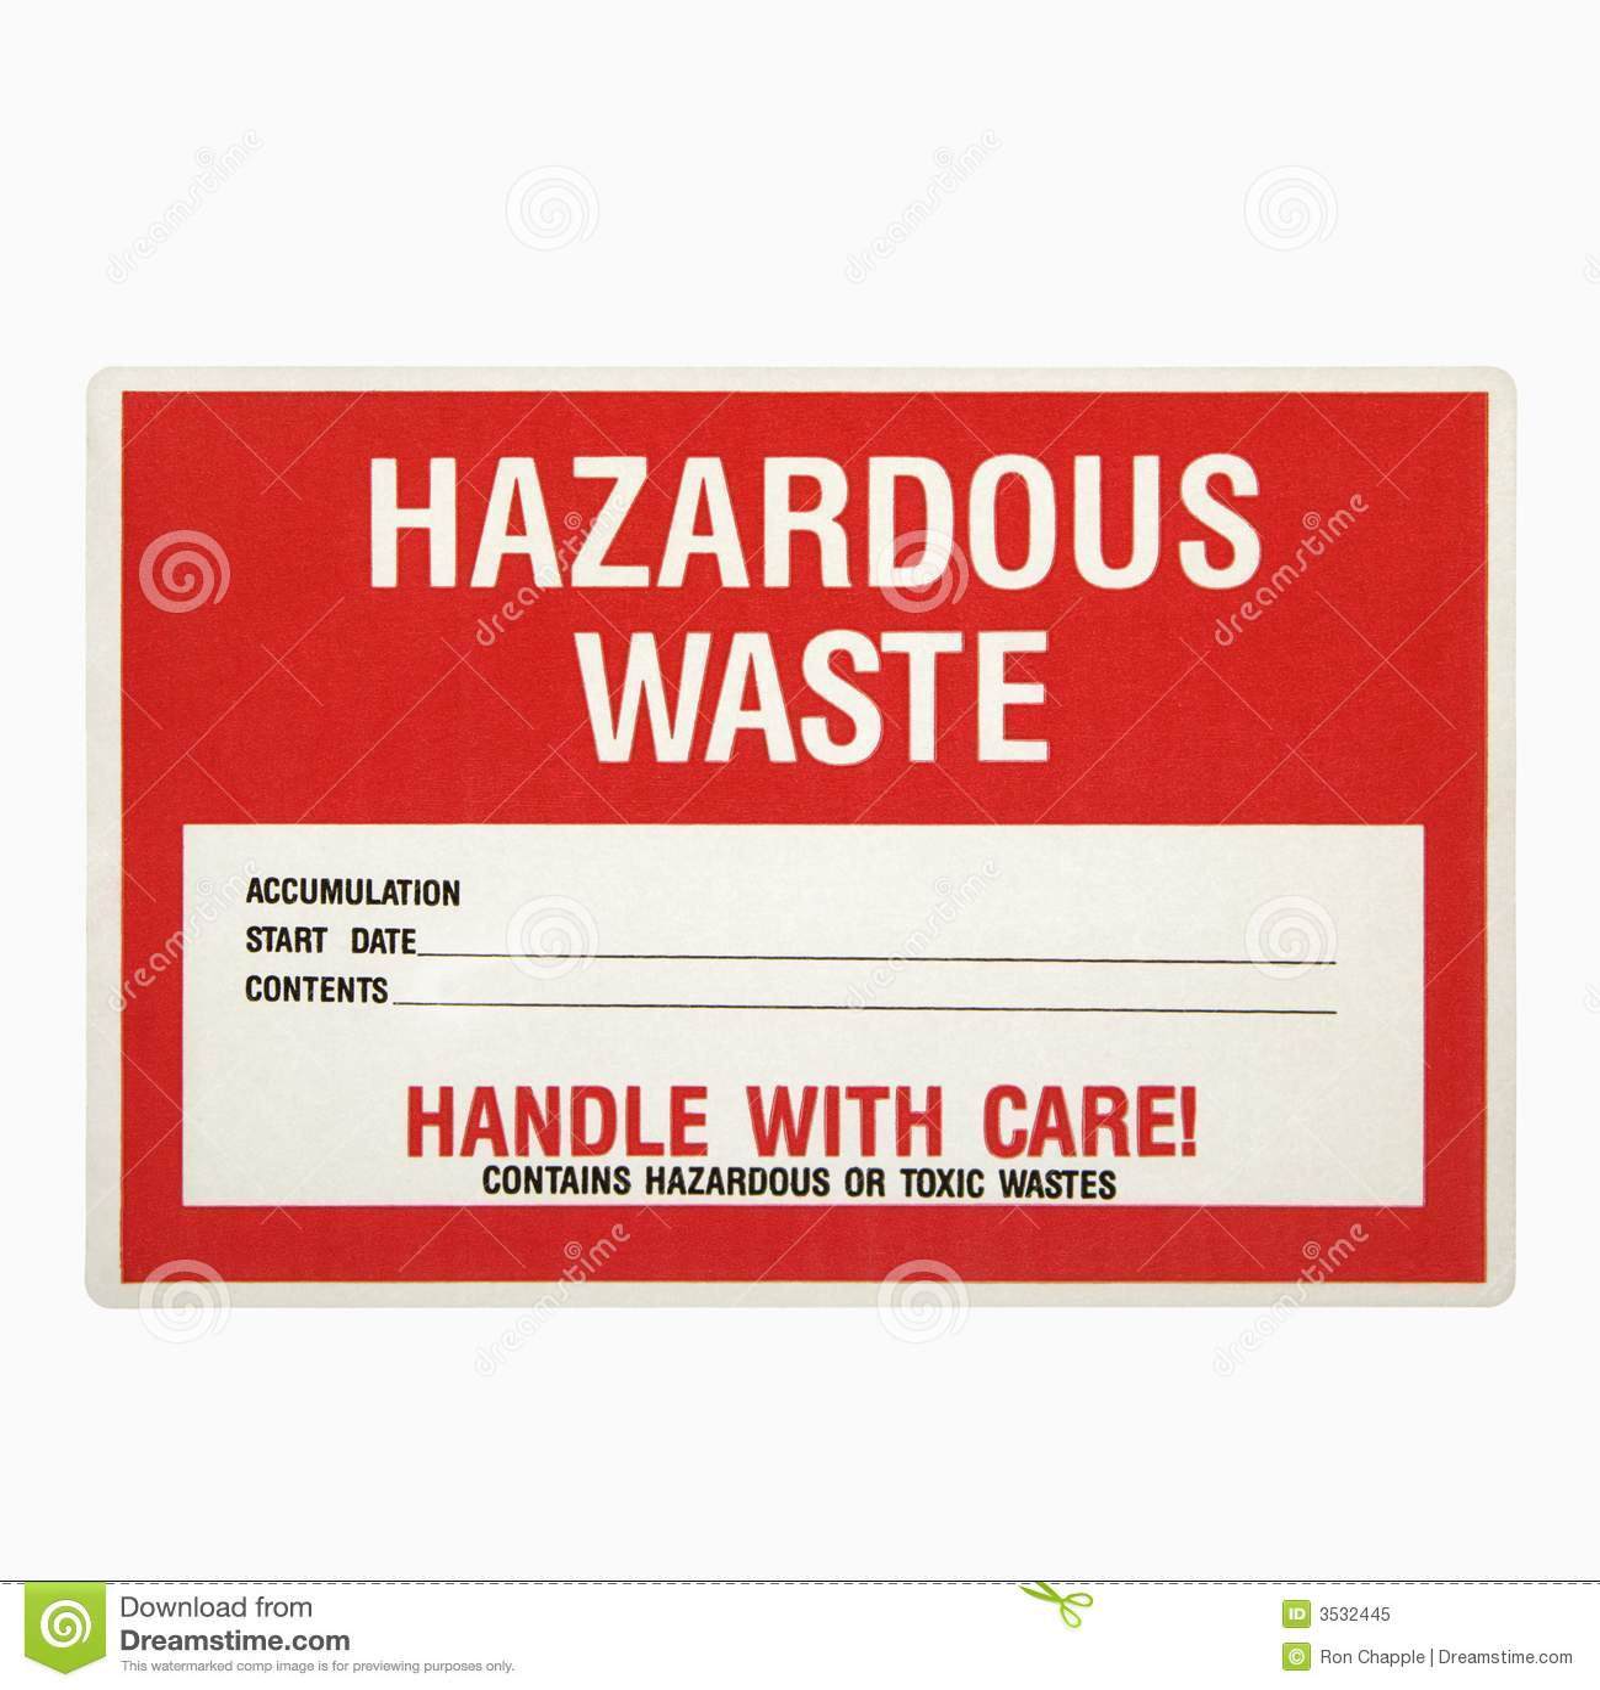 All Hazards Waste Management Planning Wmp Tool: Hazardous Waste Sign. Royalty Free Stock Photo